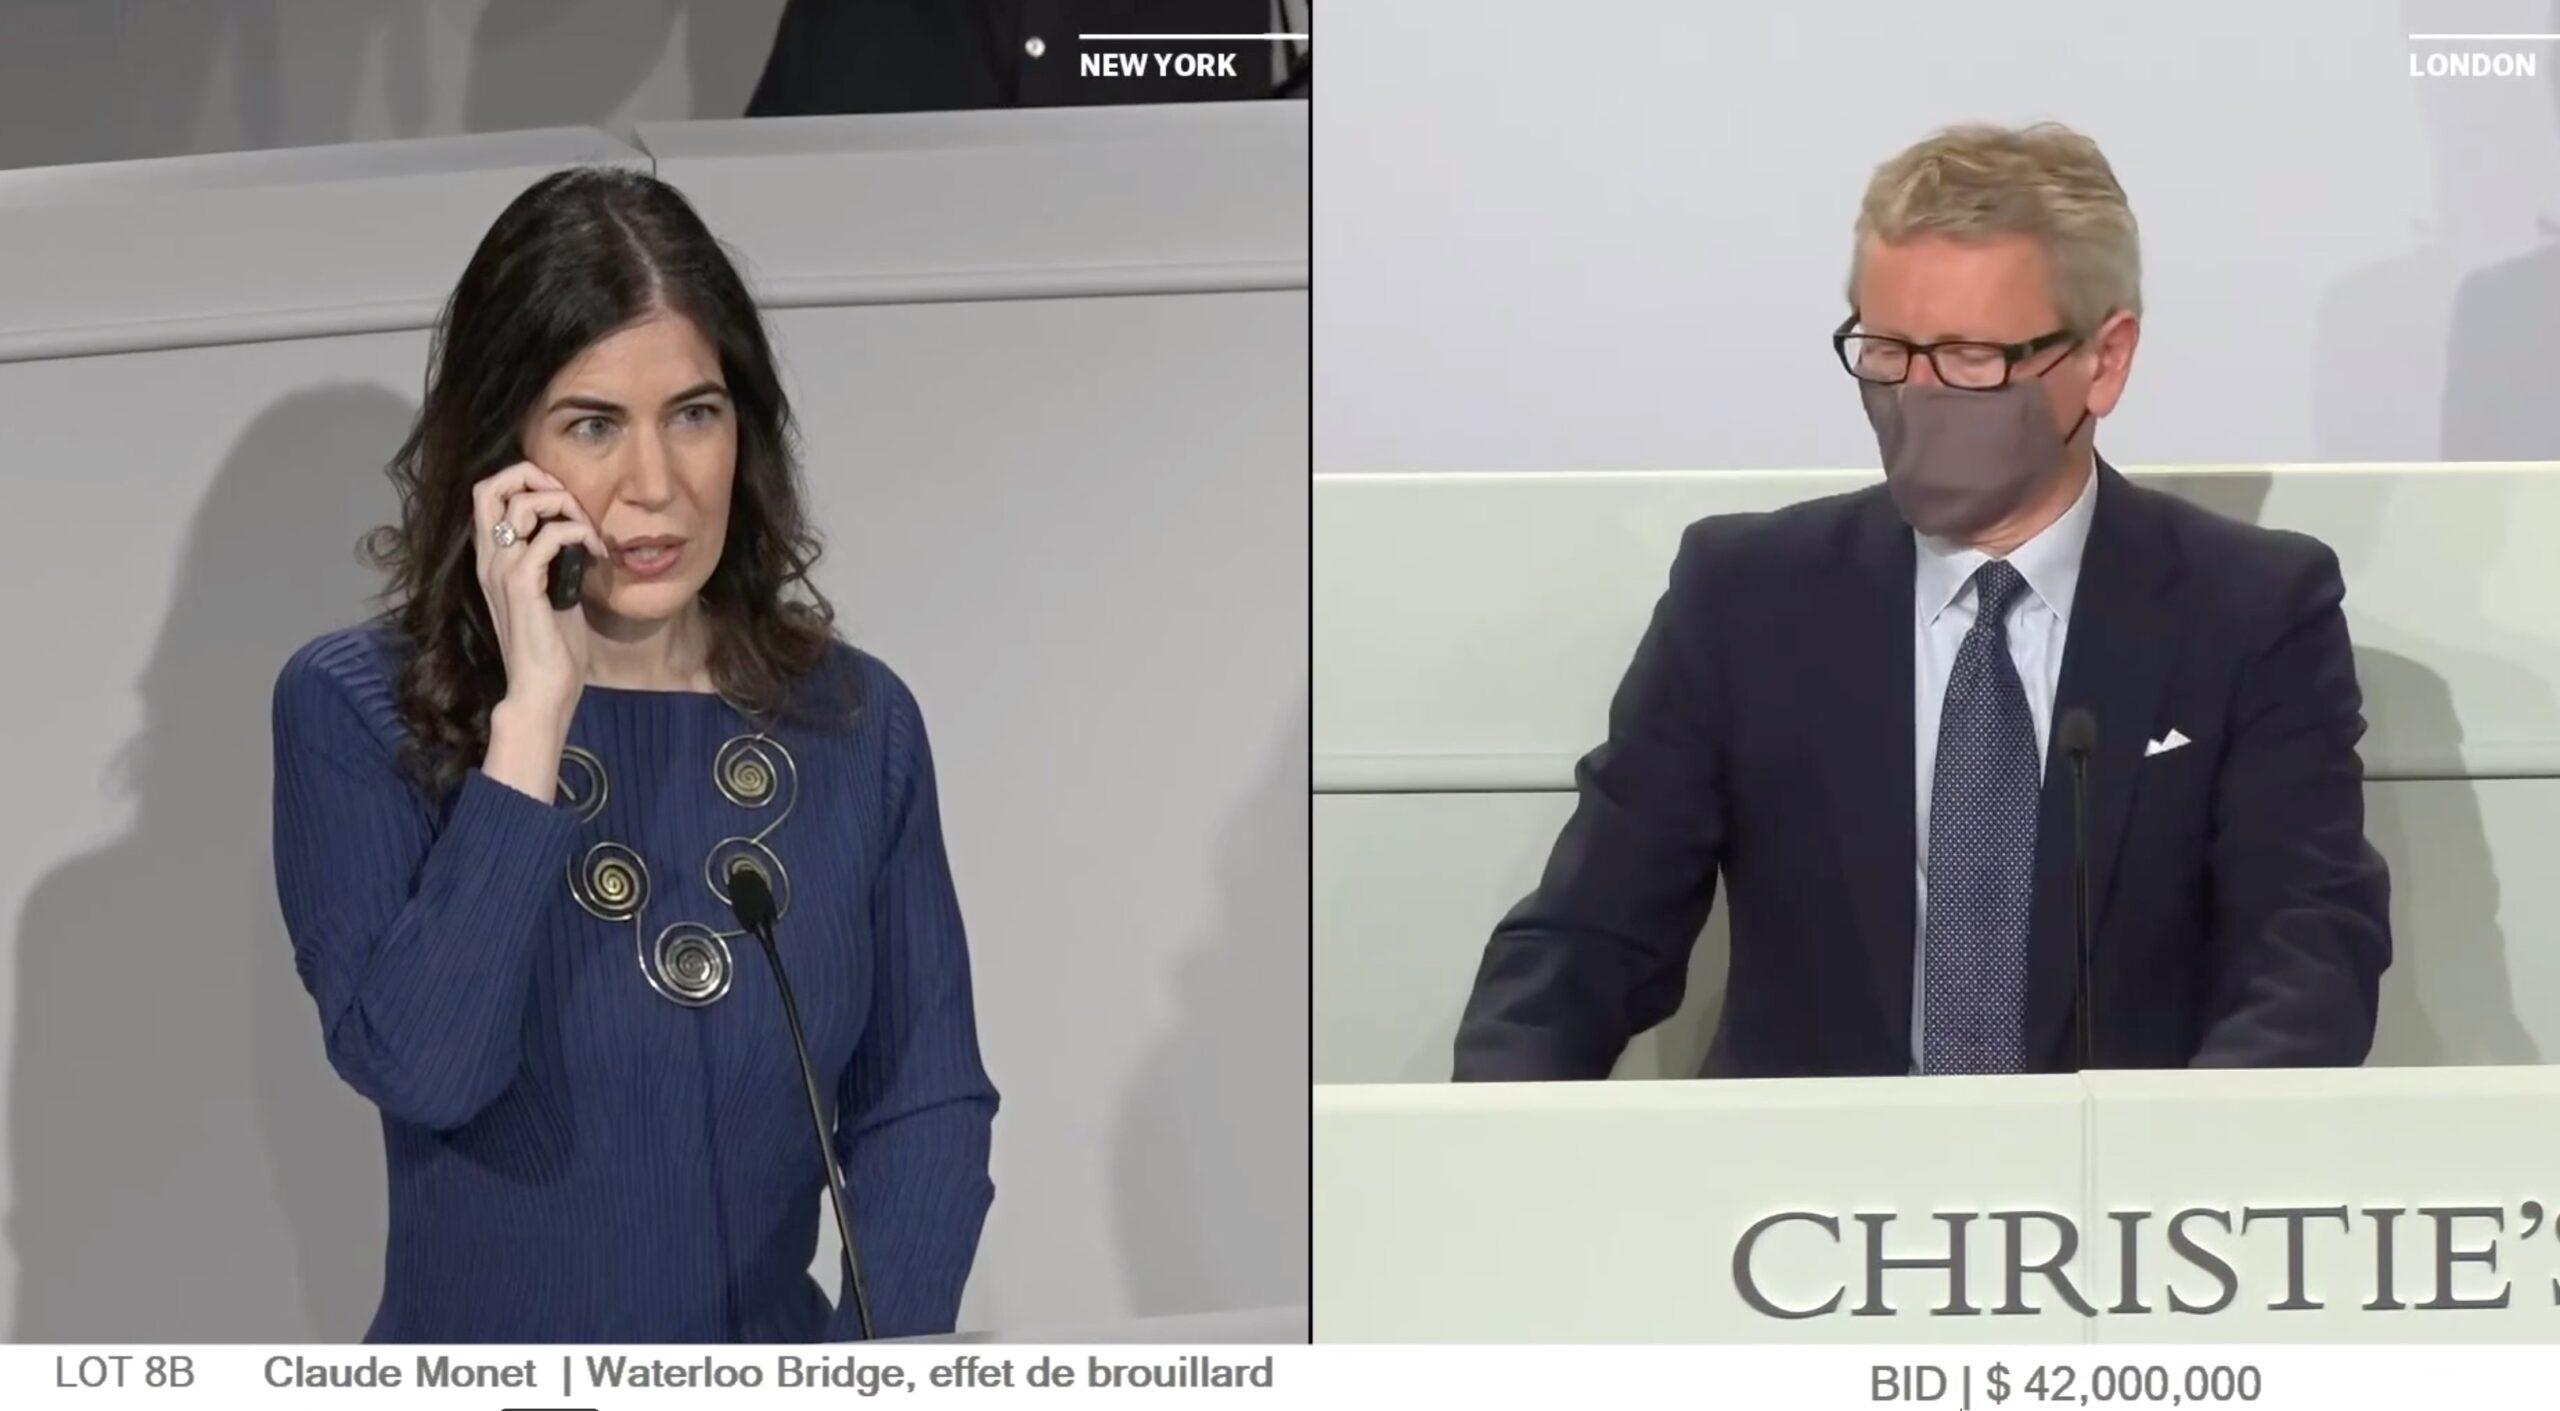 Christie's, Monet venduto per 42 milioni di dollari